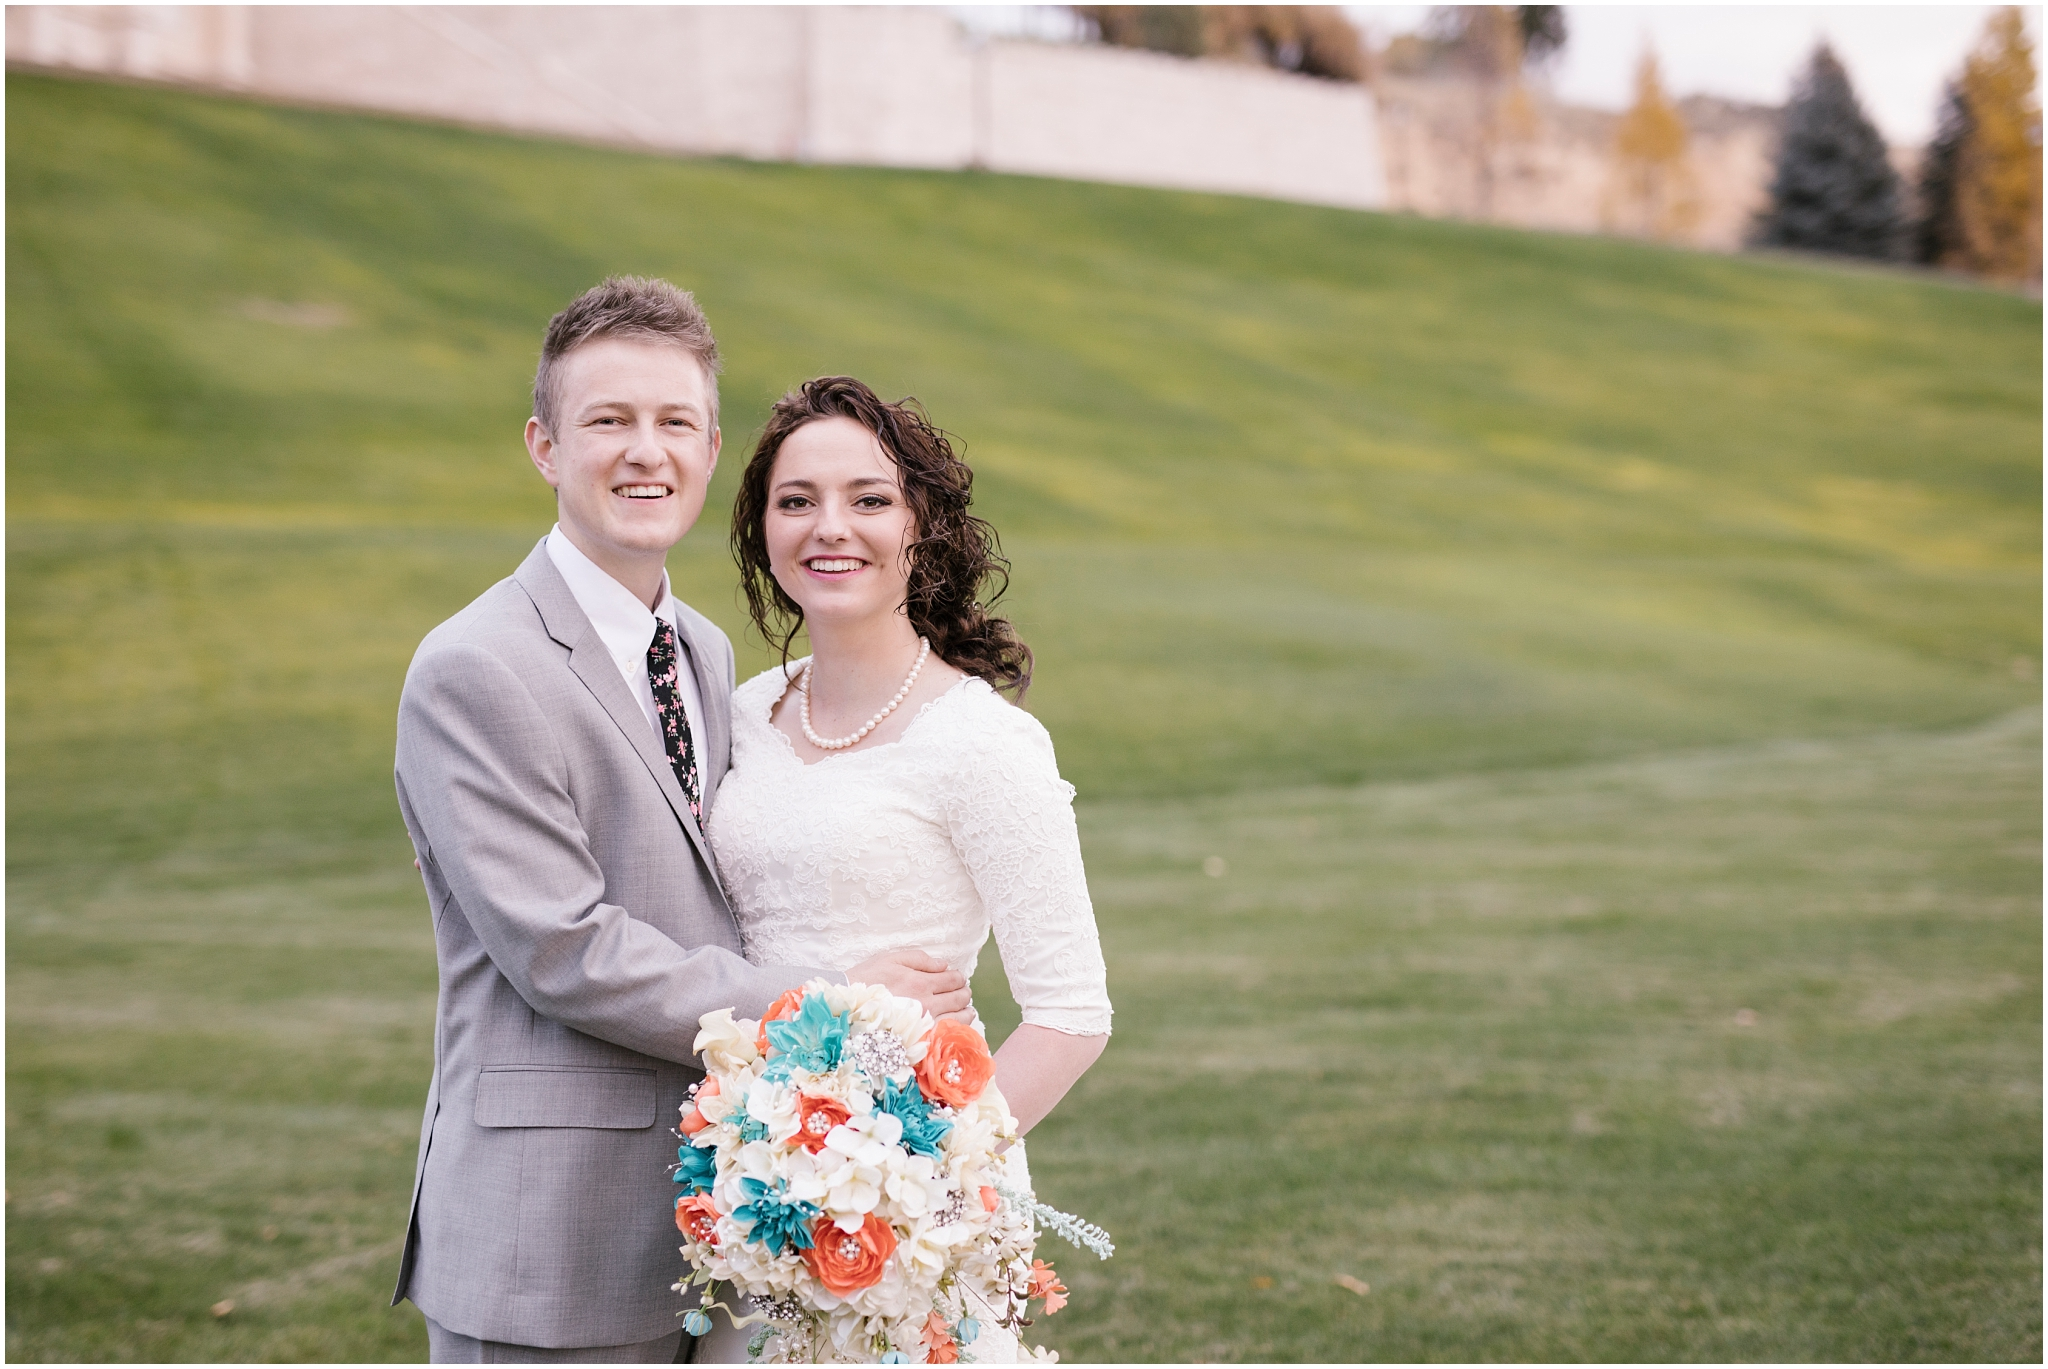 BA-Bridals-131_Lizzie-B-Imagery-Utah-Wedding-Photographer-Central-Utah-Photographer-Utah-County-Manti-Utah-Temple.jpg